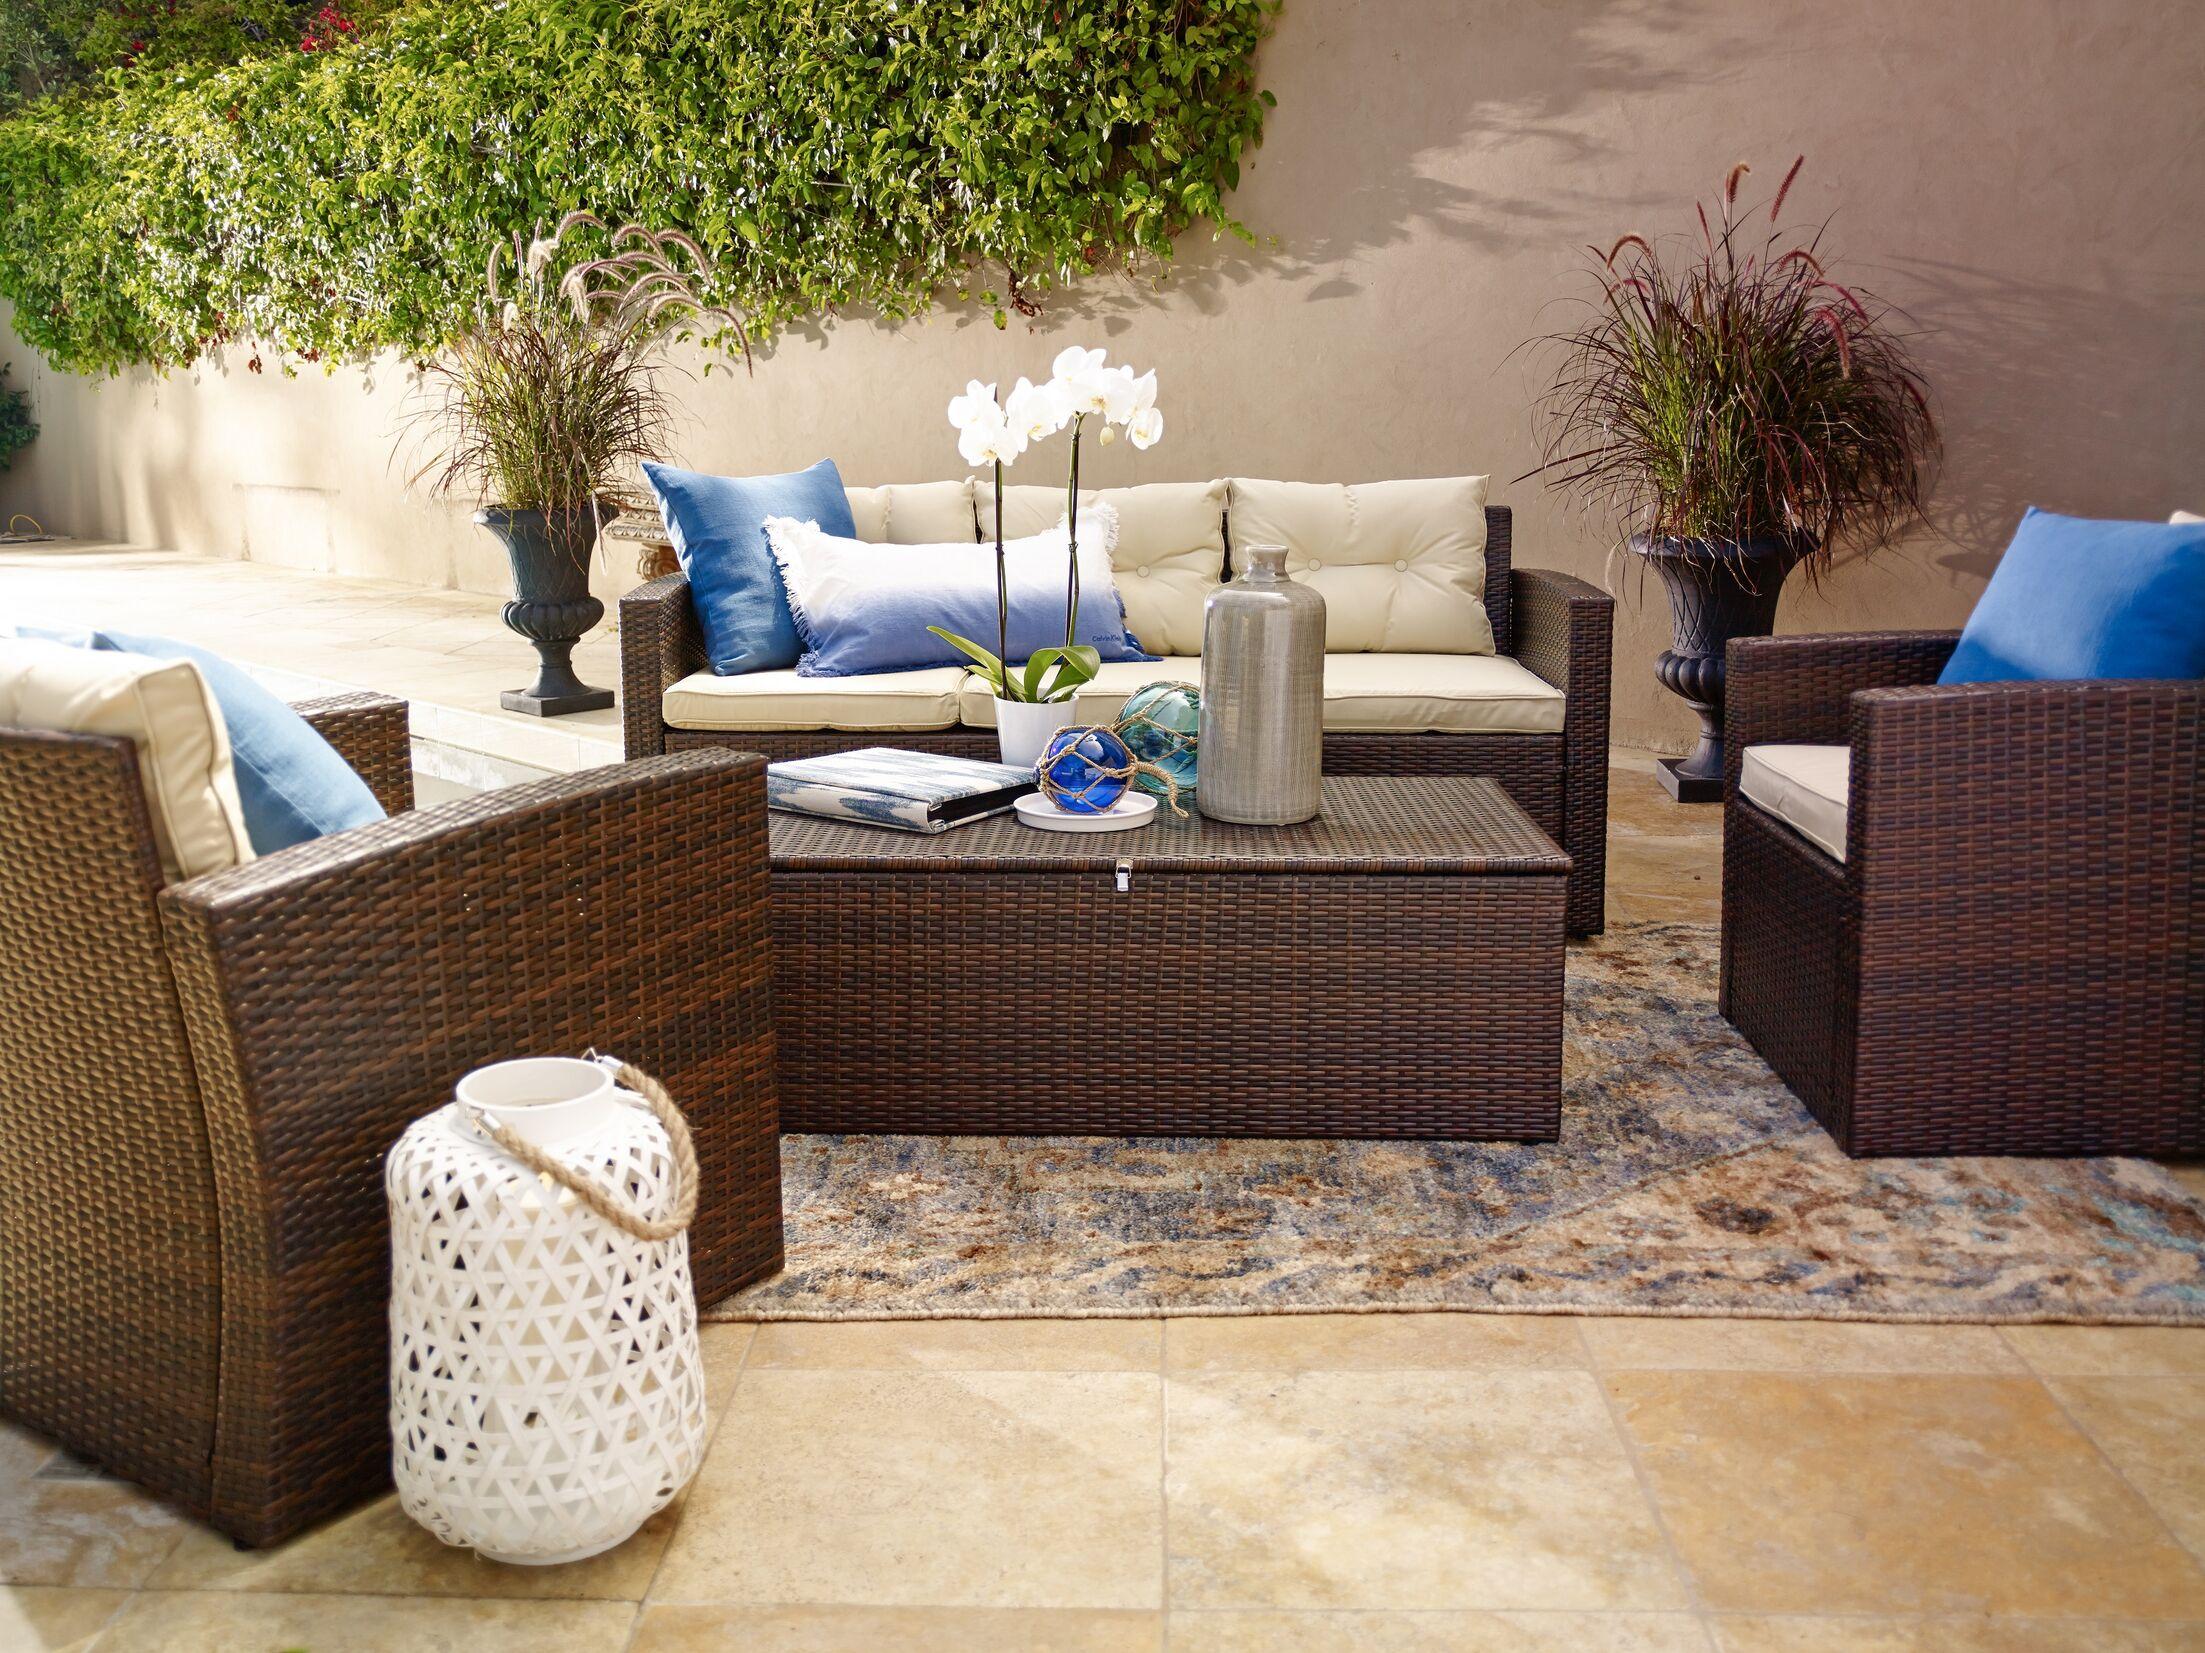 Sanor 4 Piece Sofa Set with Cushions